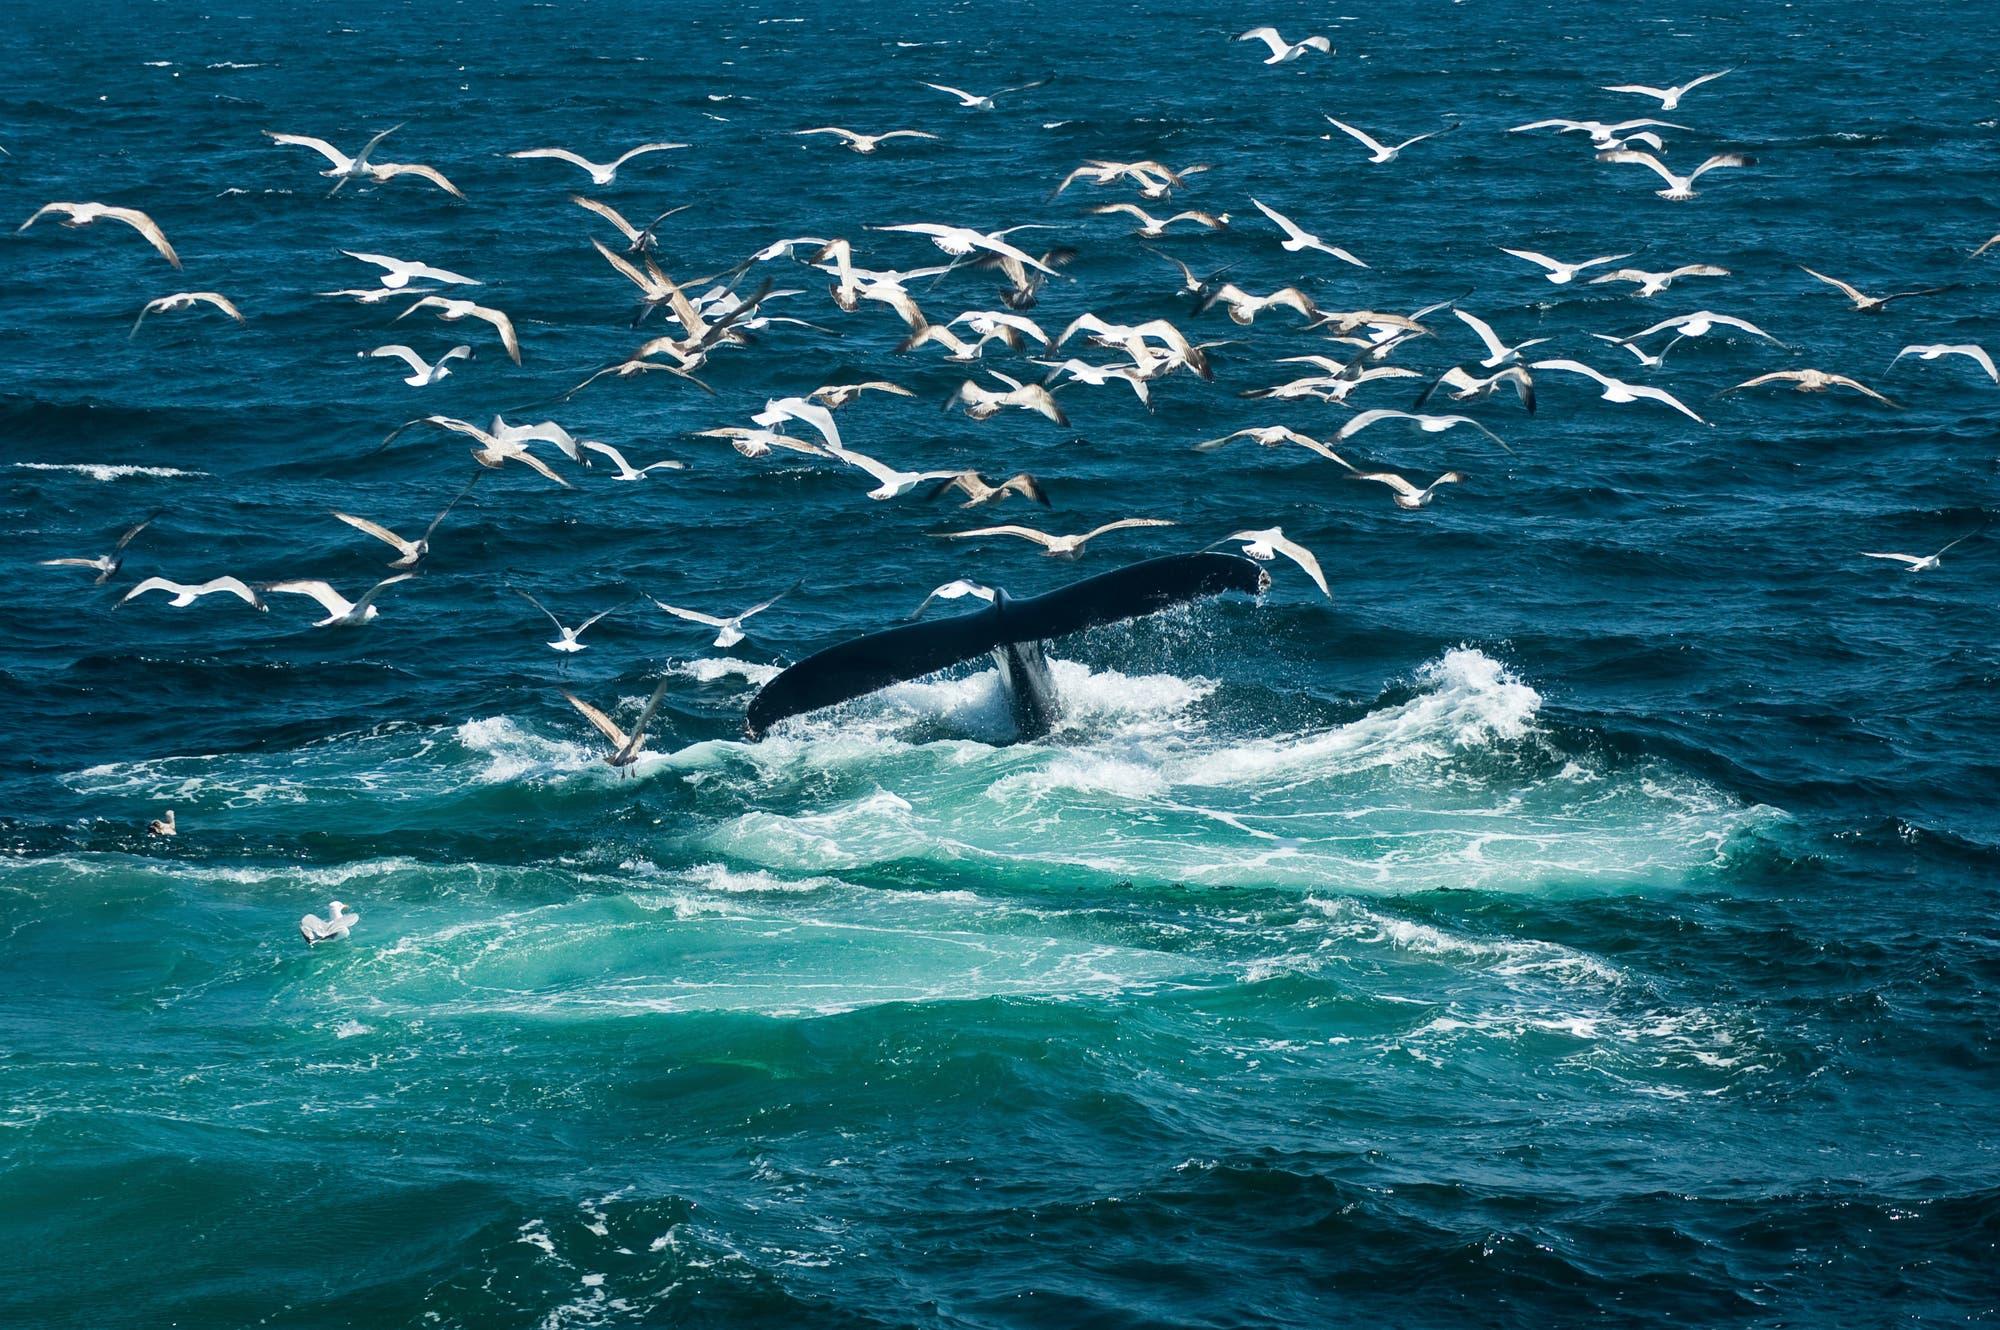 Wale füttern ganze Ökosysteme